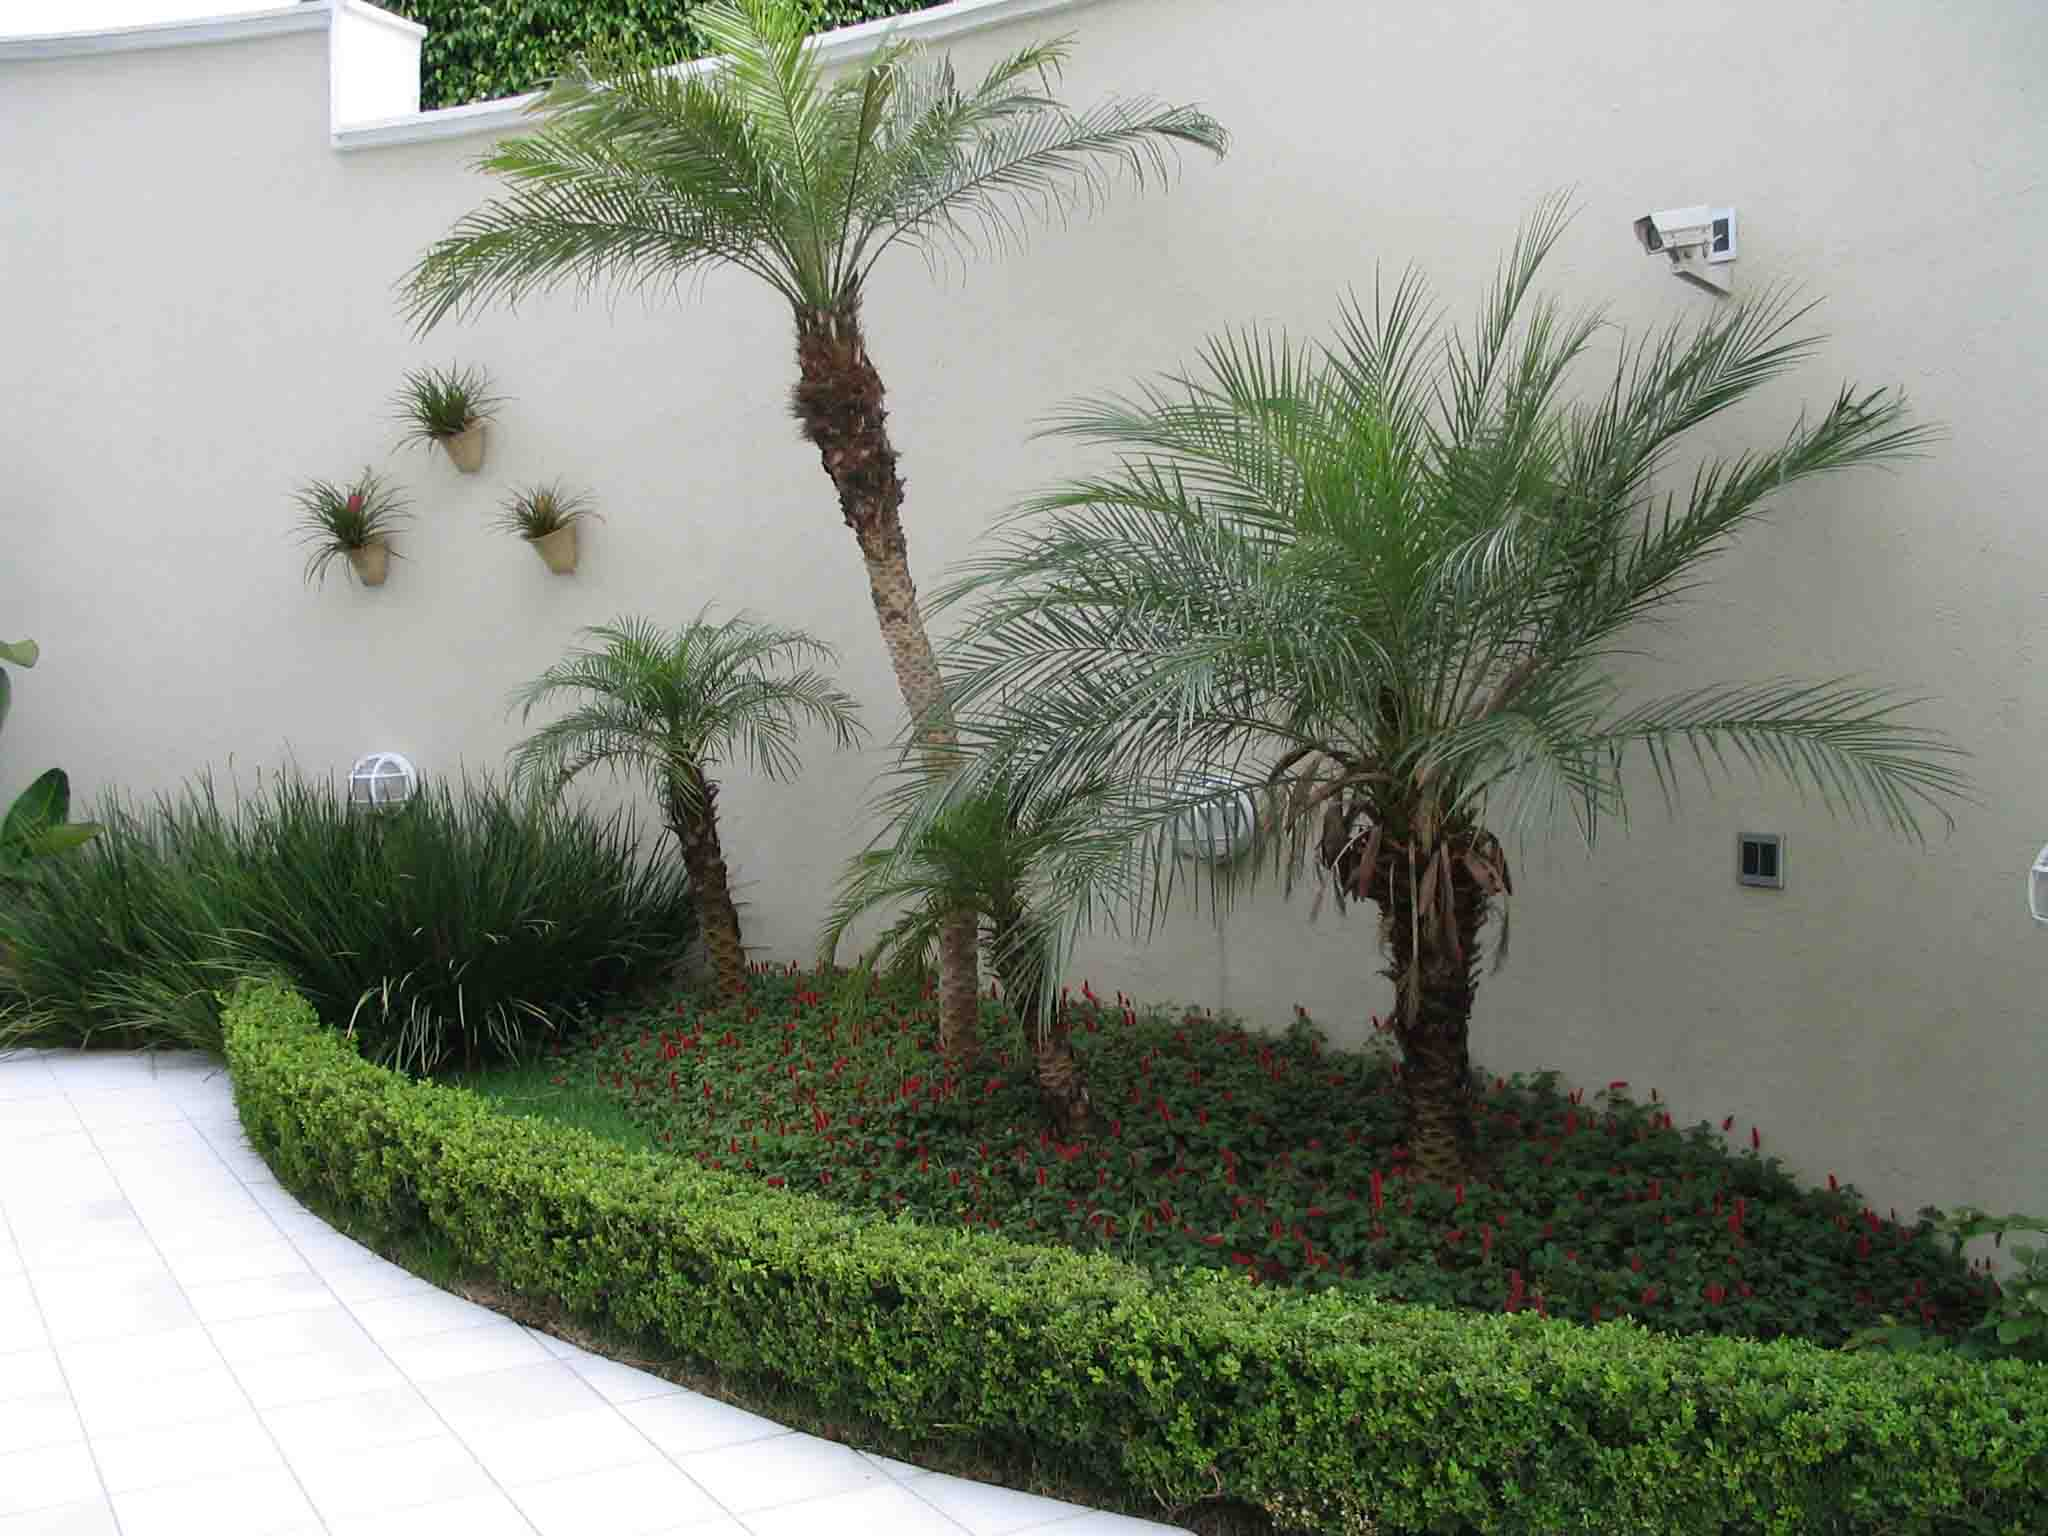 Tipos de plantas para jardim externo decorando casas for Ver jardines decorados